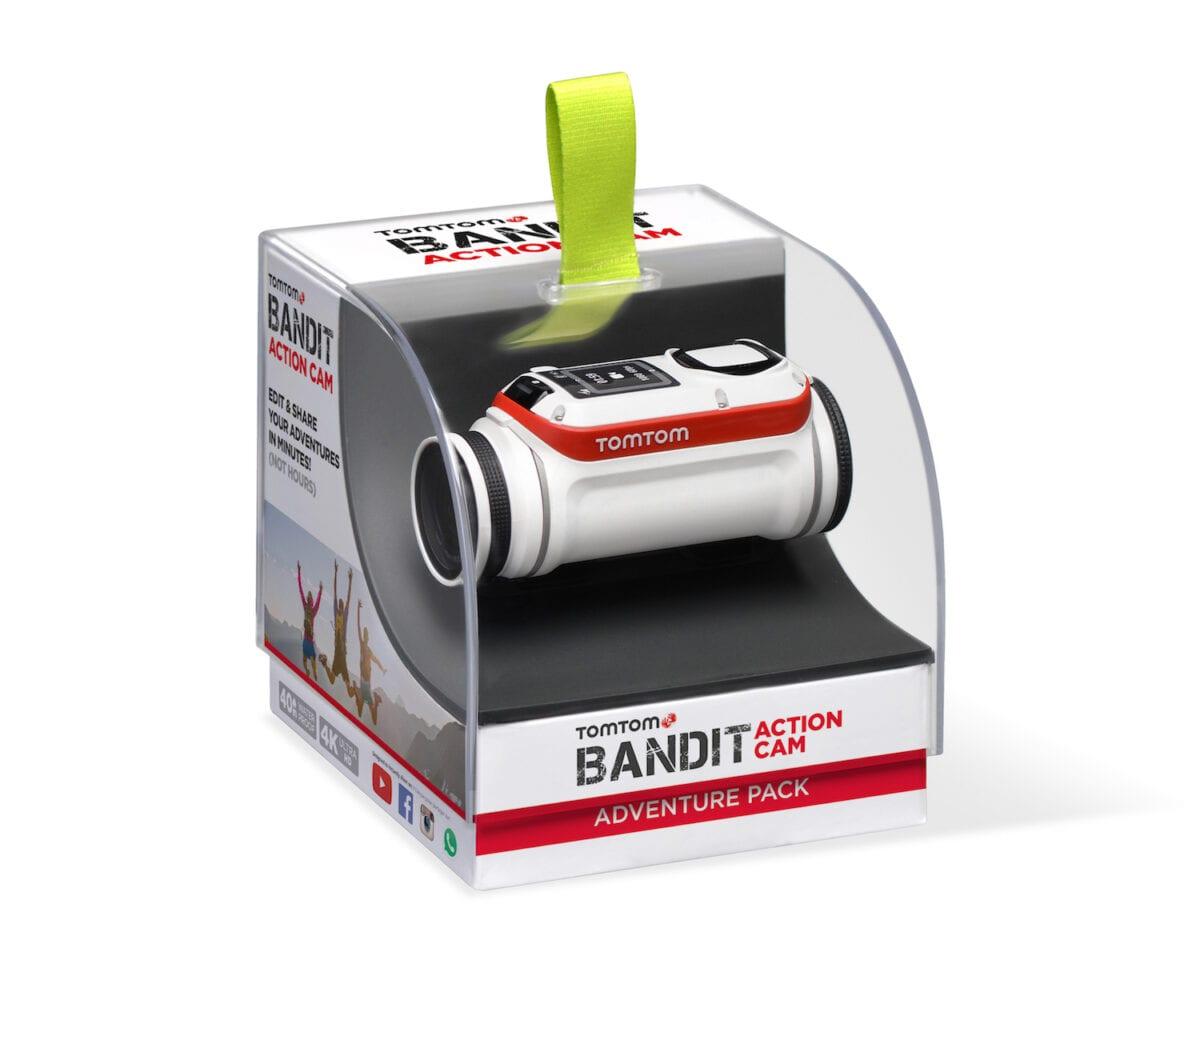 TomTom Bandit Adventure Pack lores